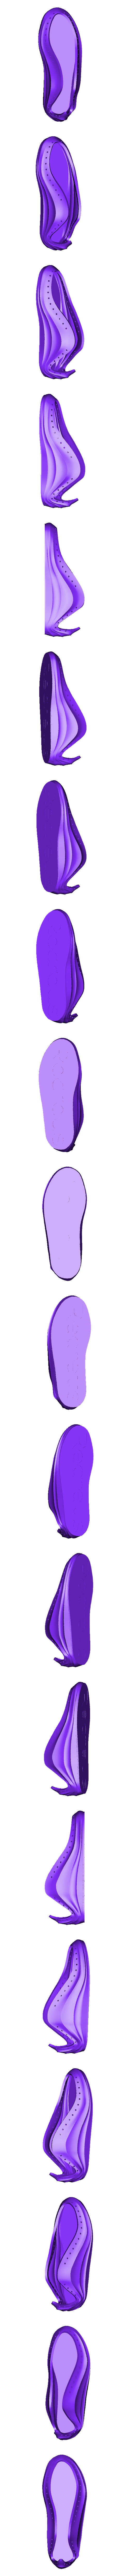 Recreus_sneakers.stl Download free STL file Sneaker with FILAFLEX Elastic filament • Design to 3D print, Ignacio